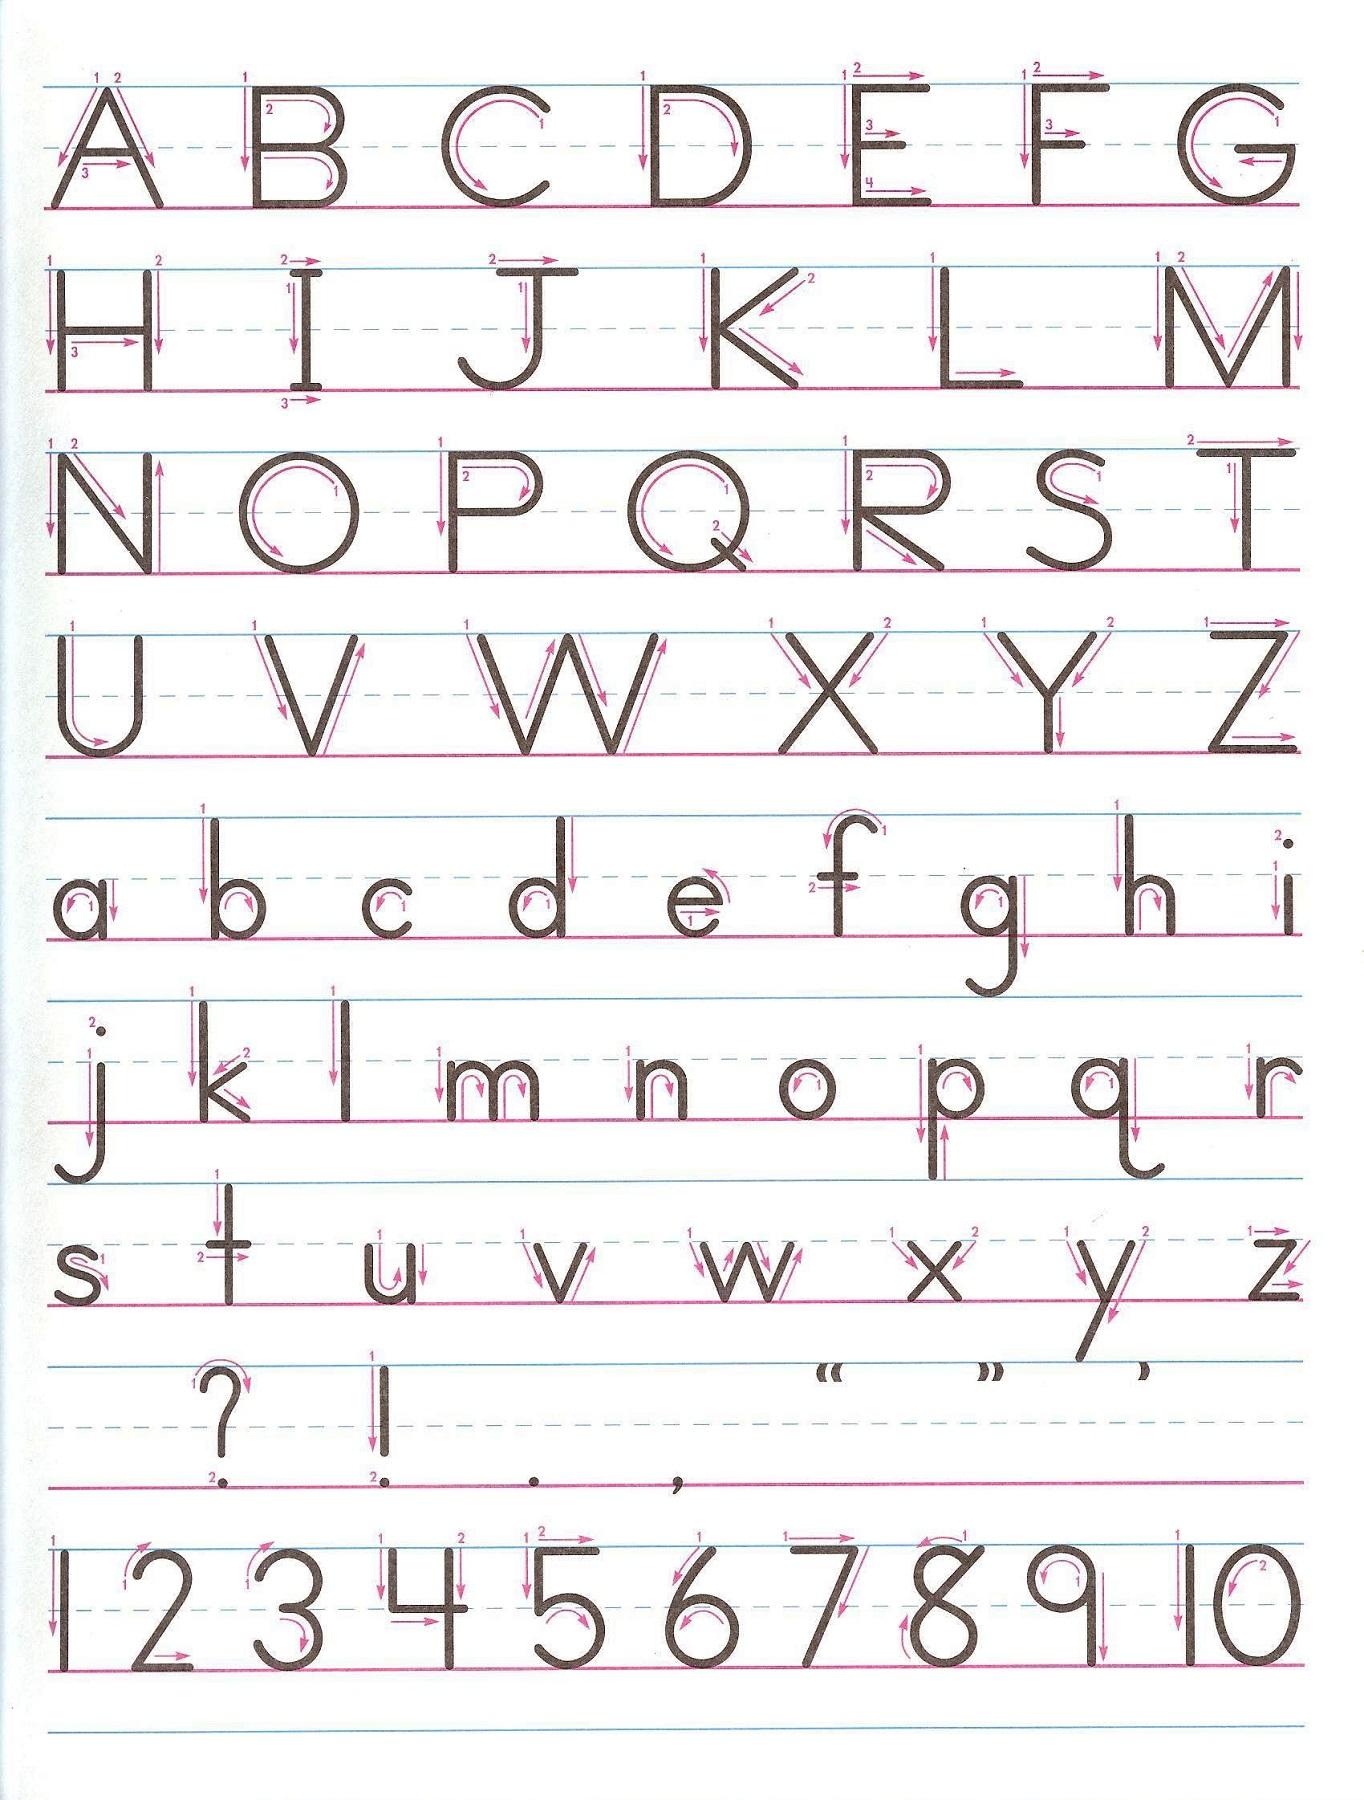 Alphabets Writing